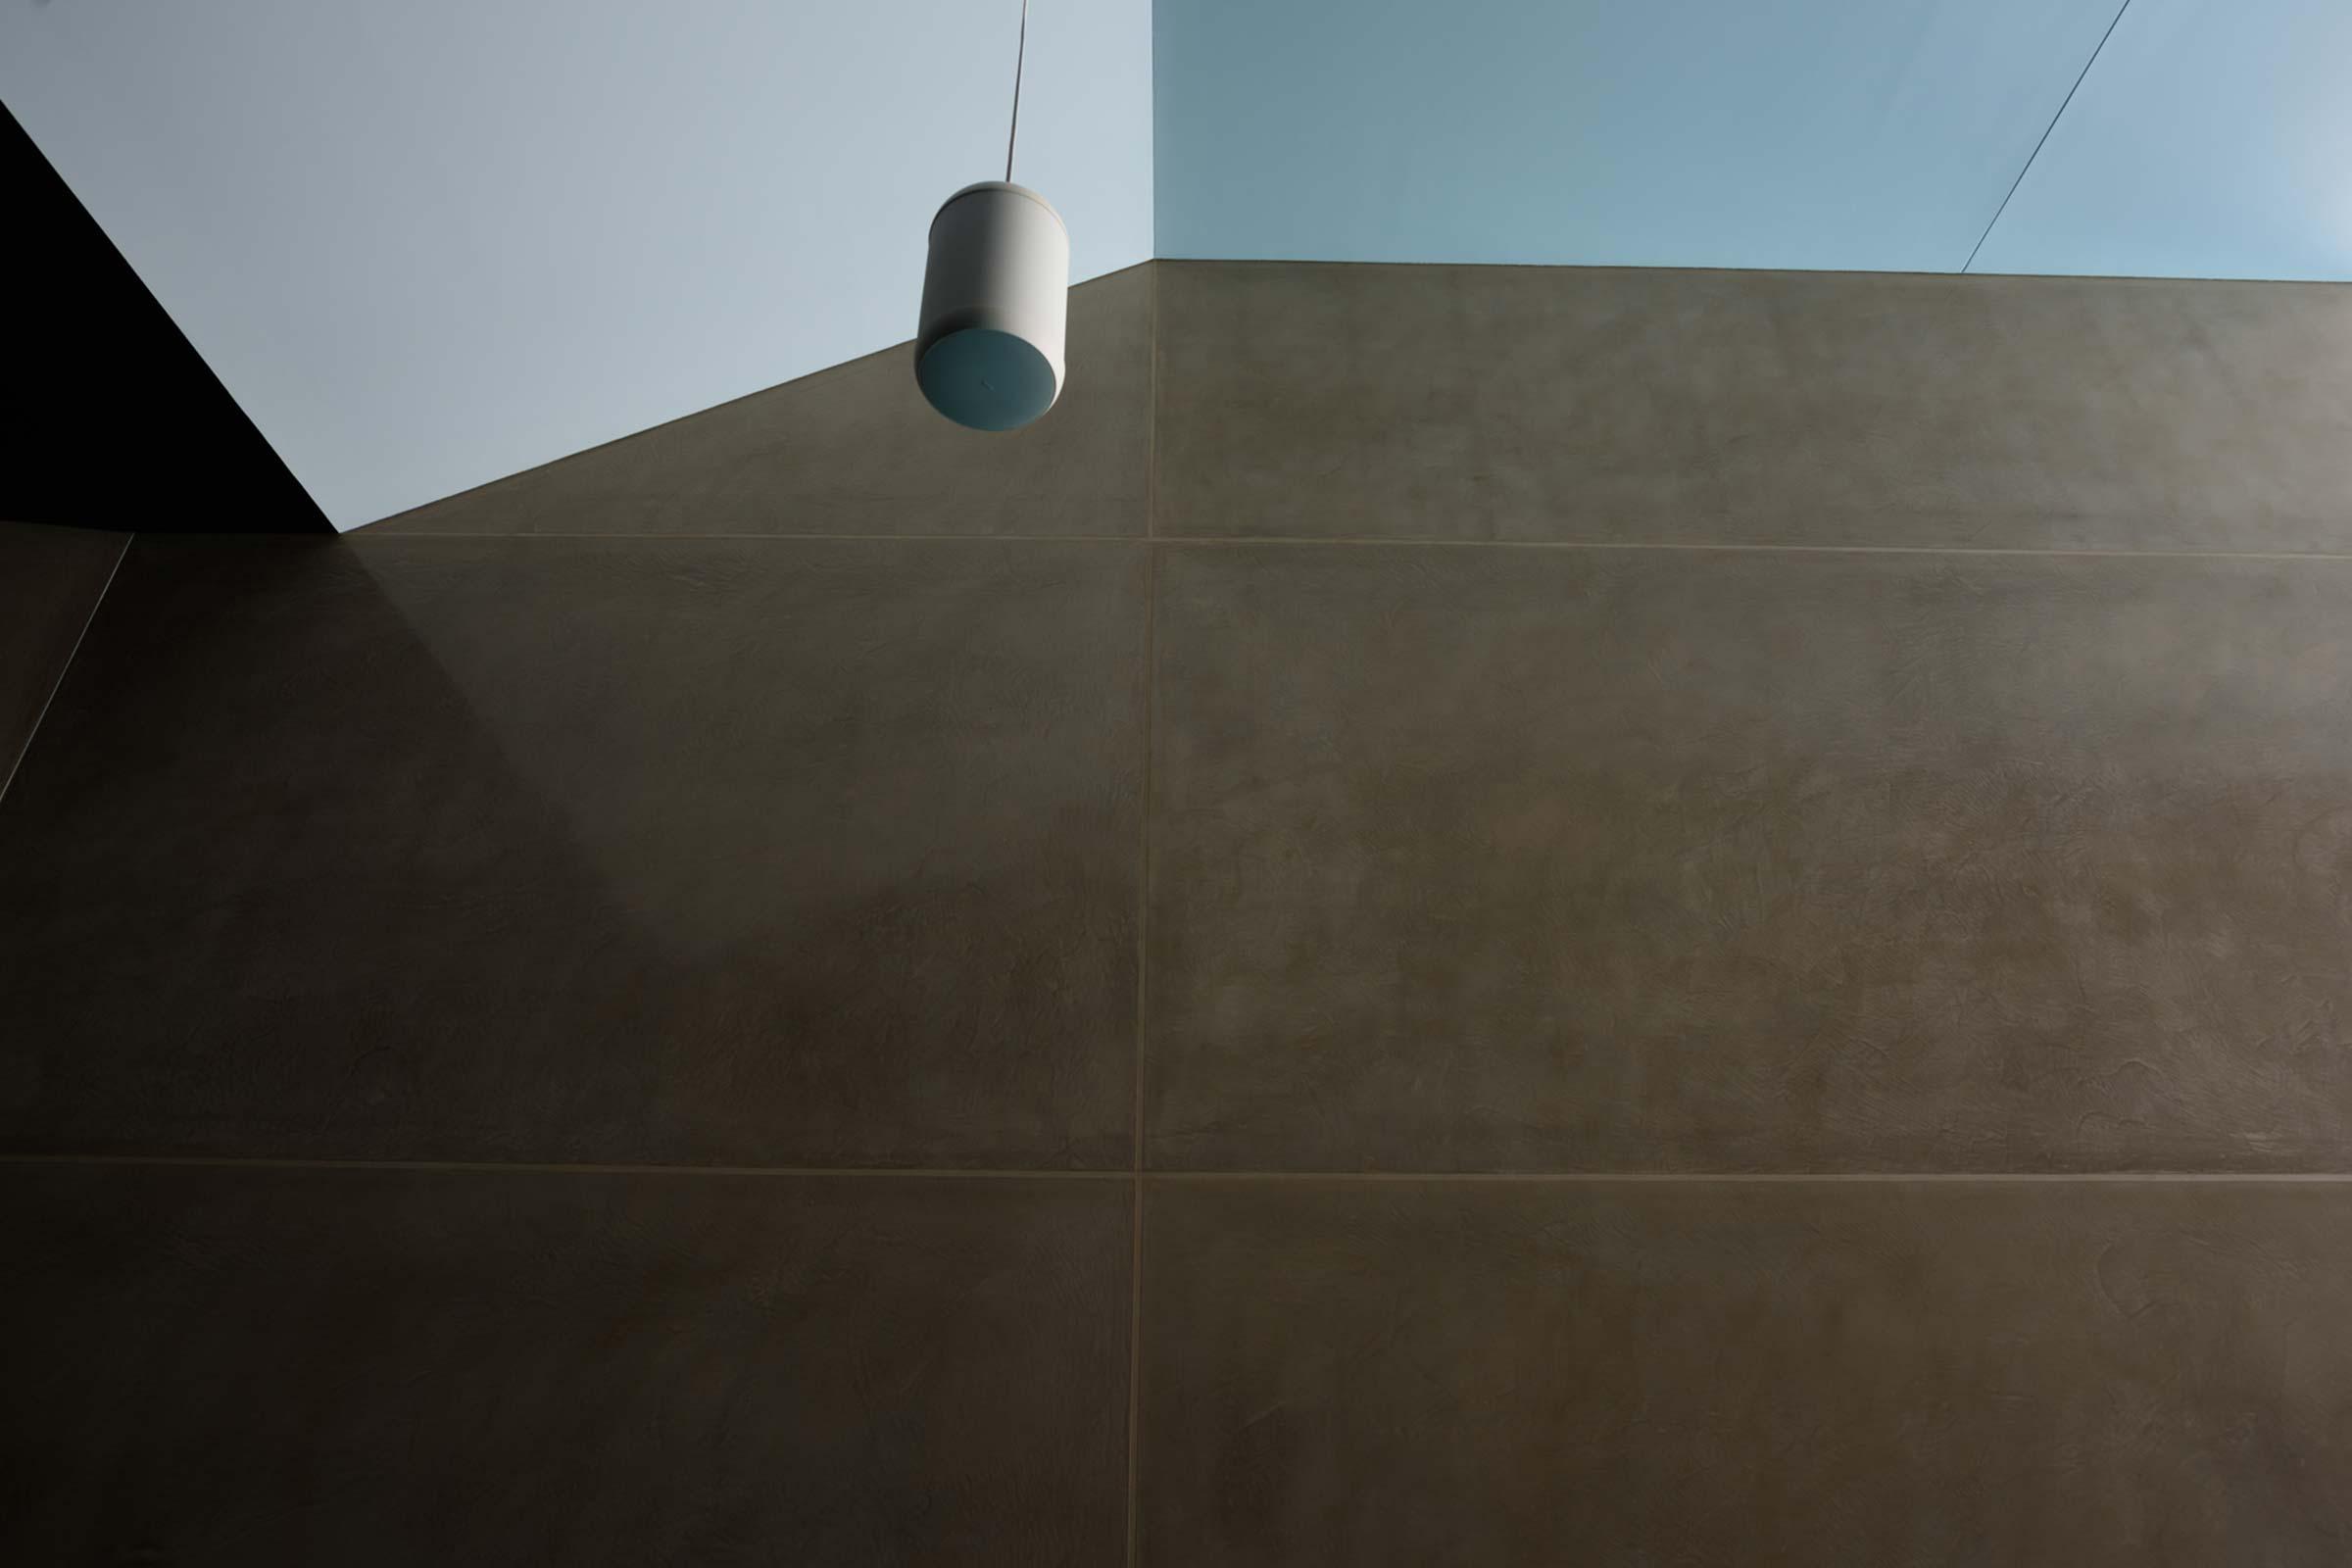 Dulux Venetian Plaster Perth Stadium 08 Marmorino Feature Wall